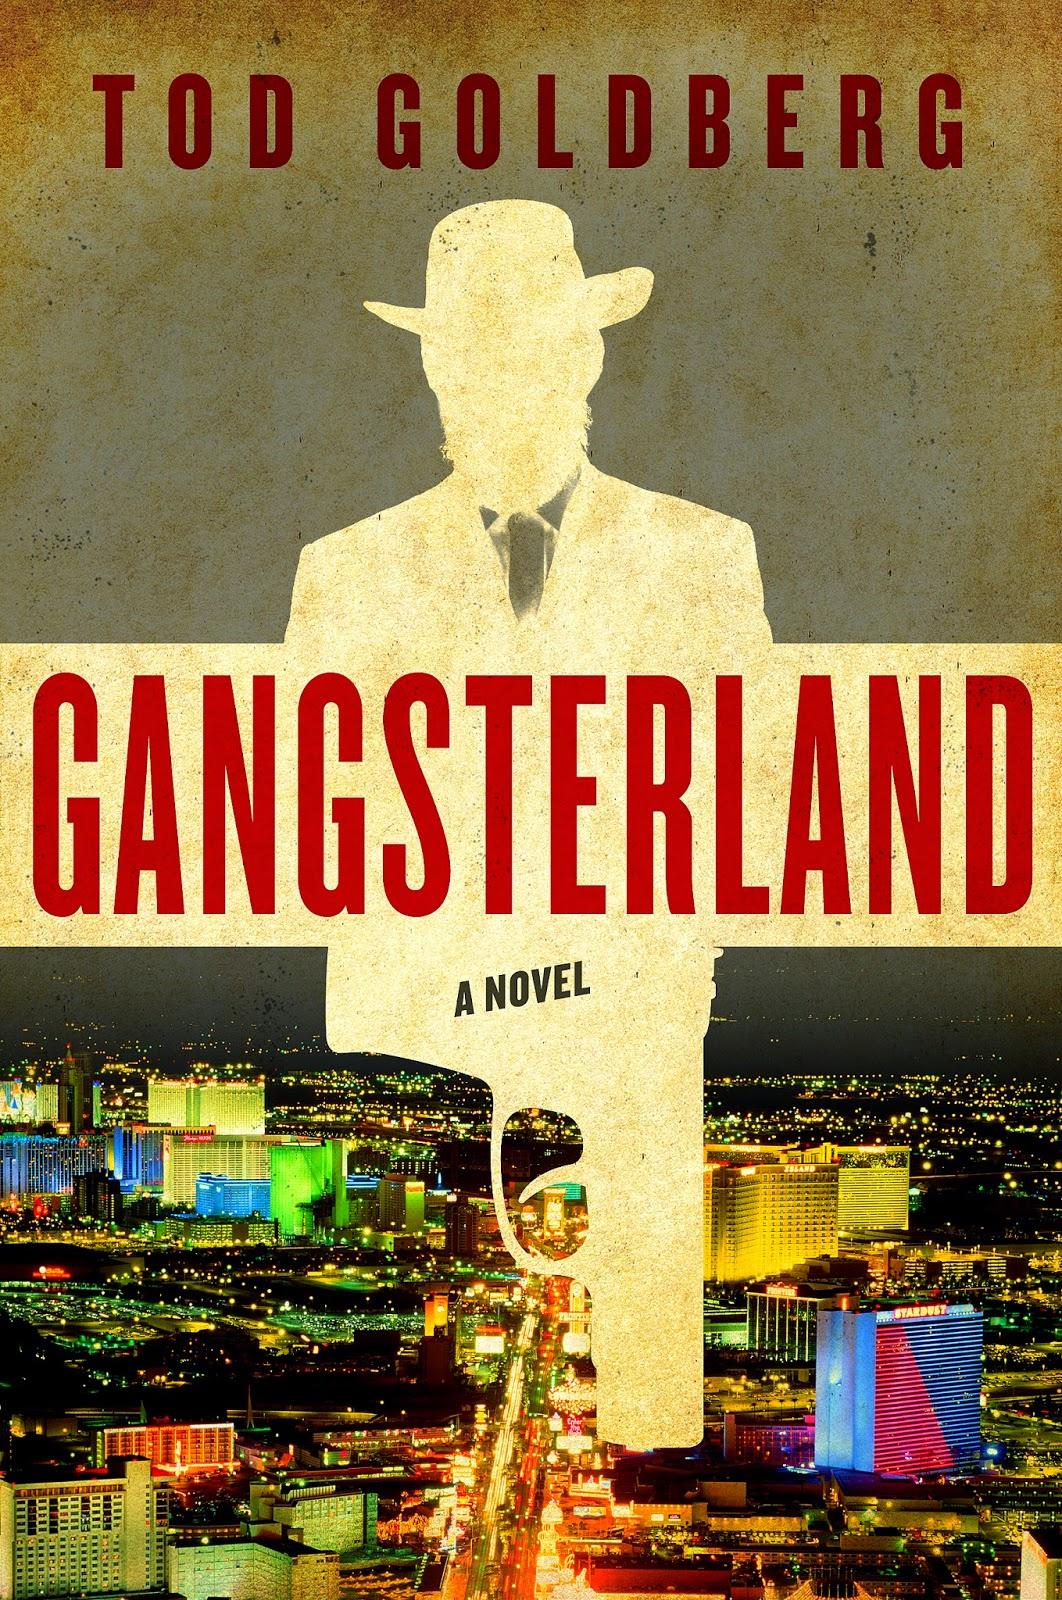 Crime Fiction: <i>Gangsterland</i>&nbsp; by Tod Goldberg